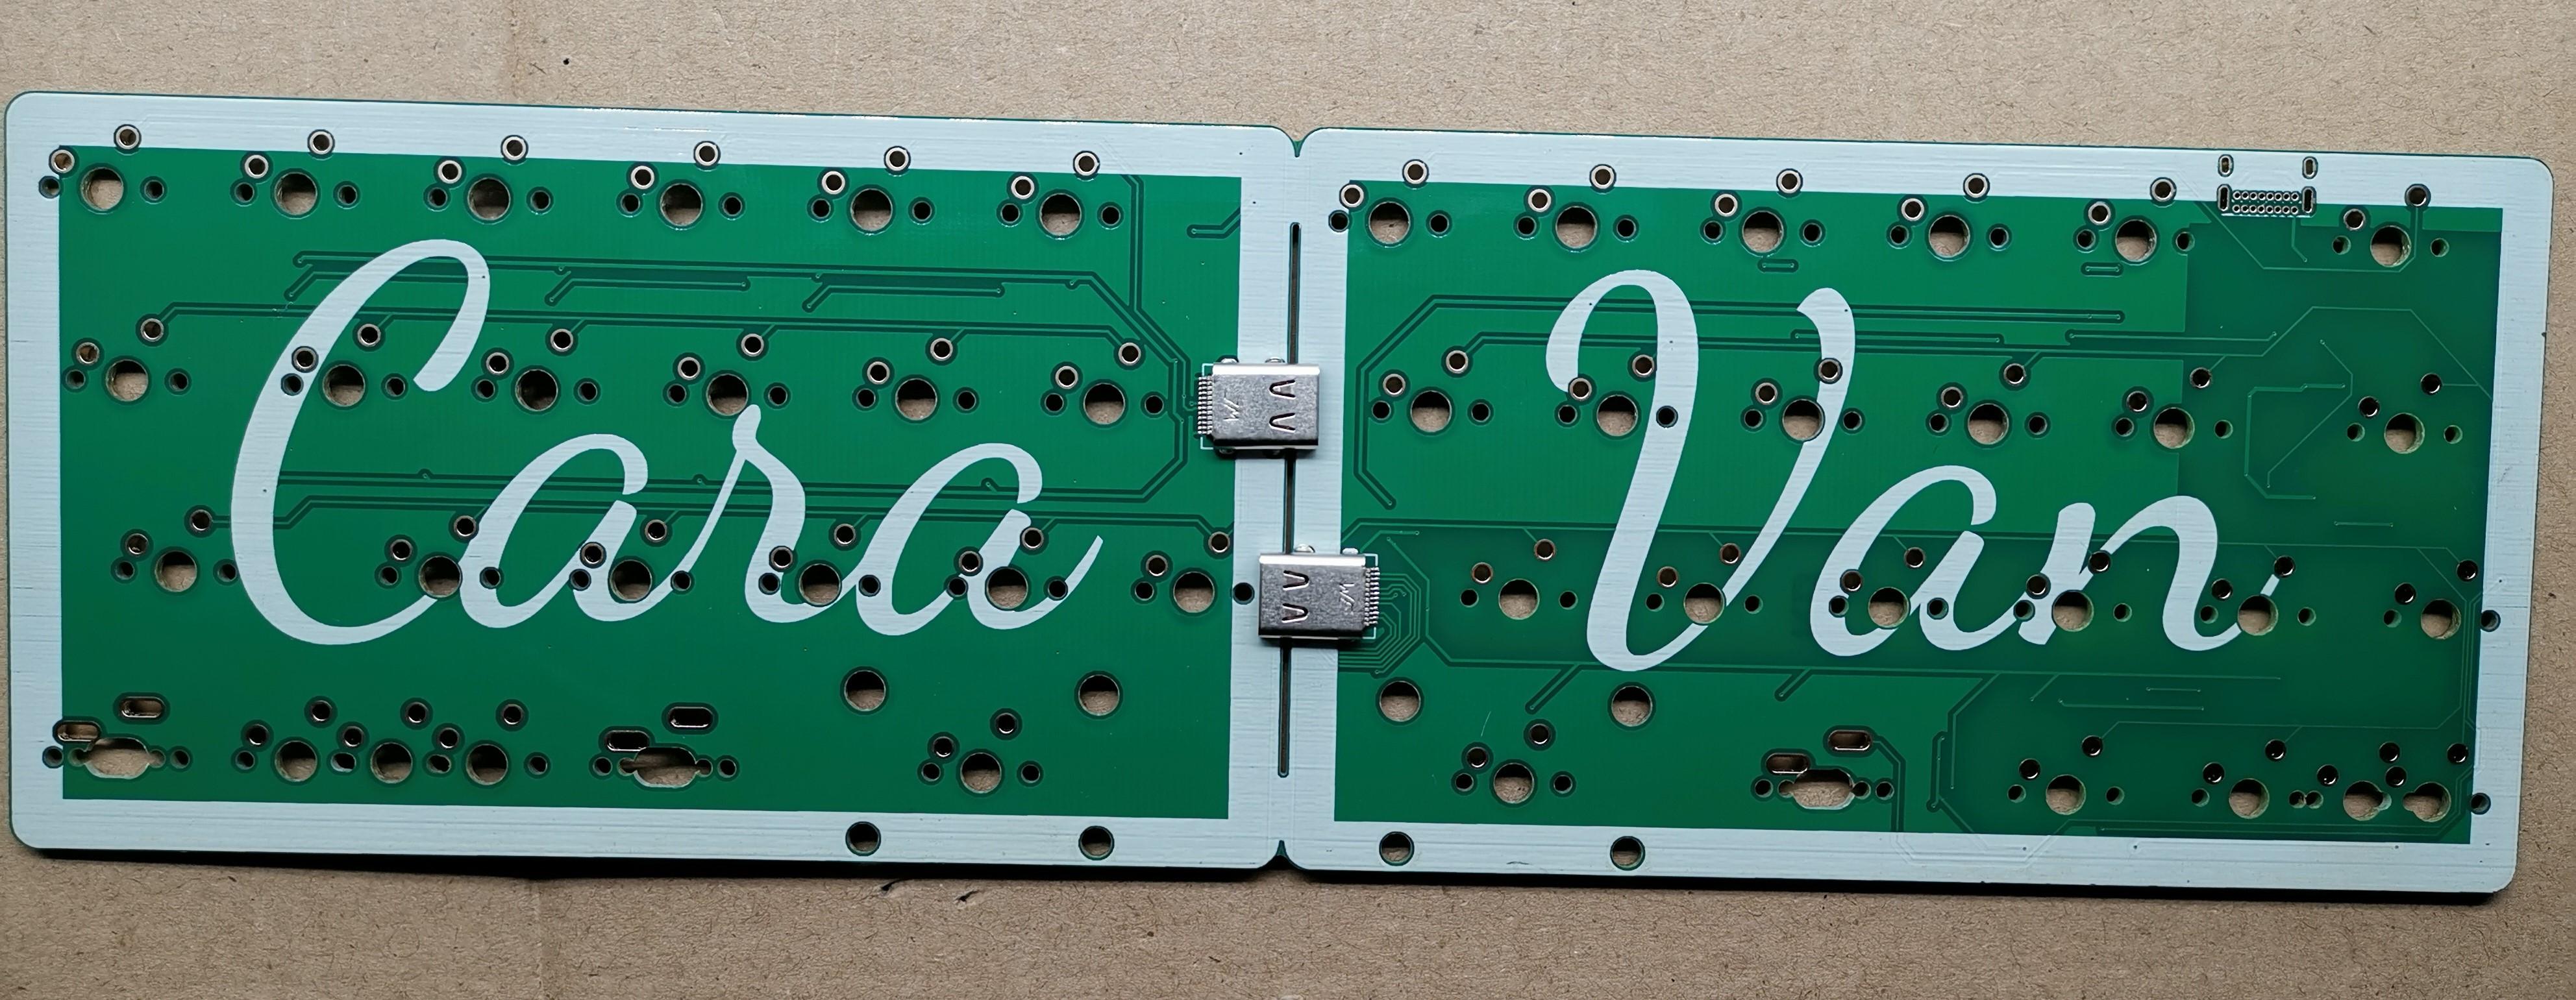 CaraVan 2 PCB front